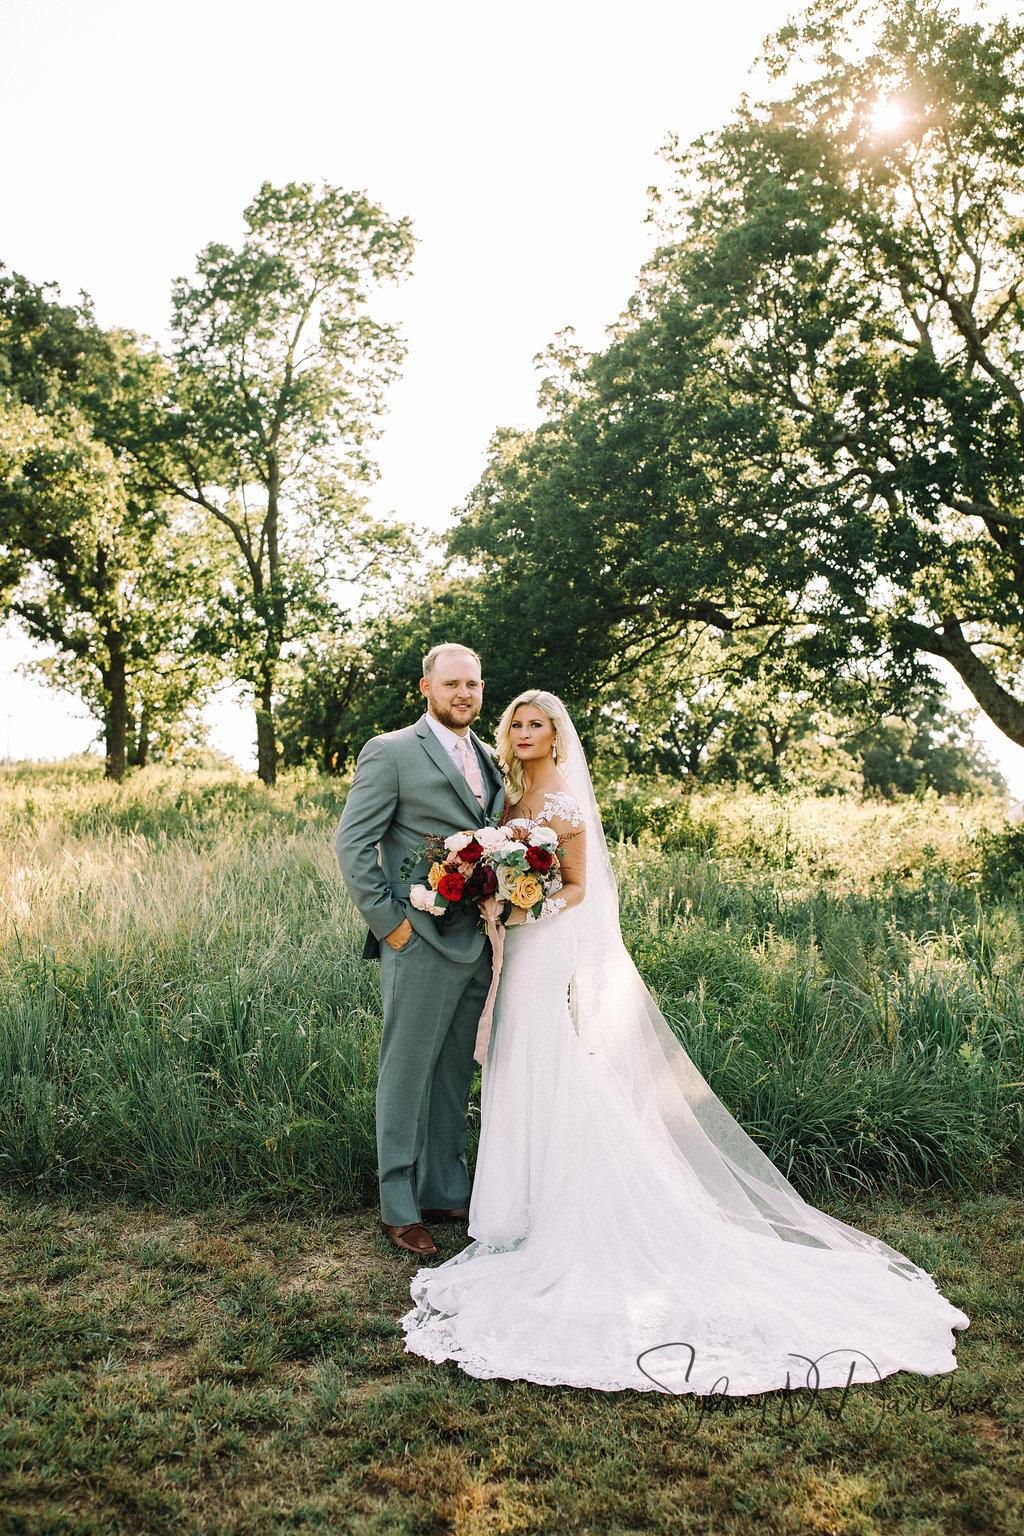 sydney-davidson-wedding-stillwater-oklahoma-wedding-session-traveling-photographer-portrait-tulsa-oklahoma-3380.jpg